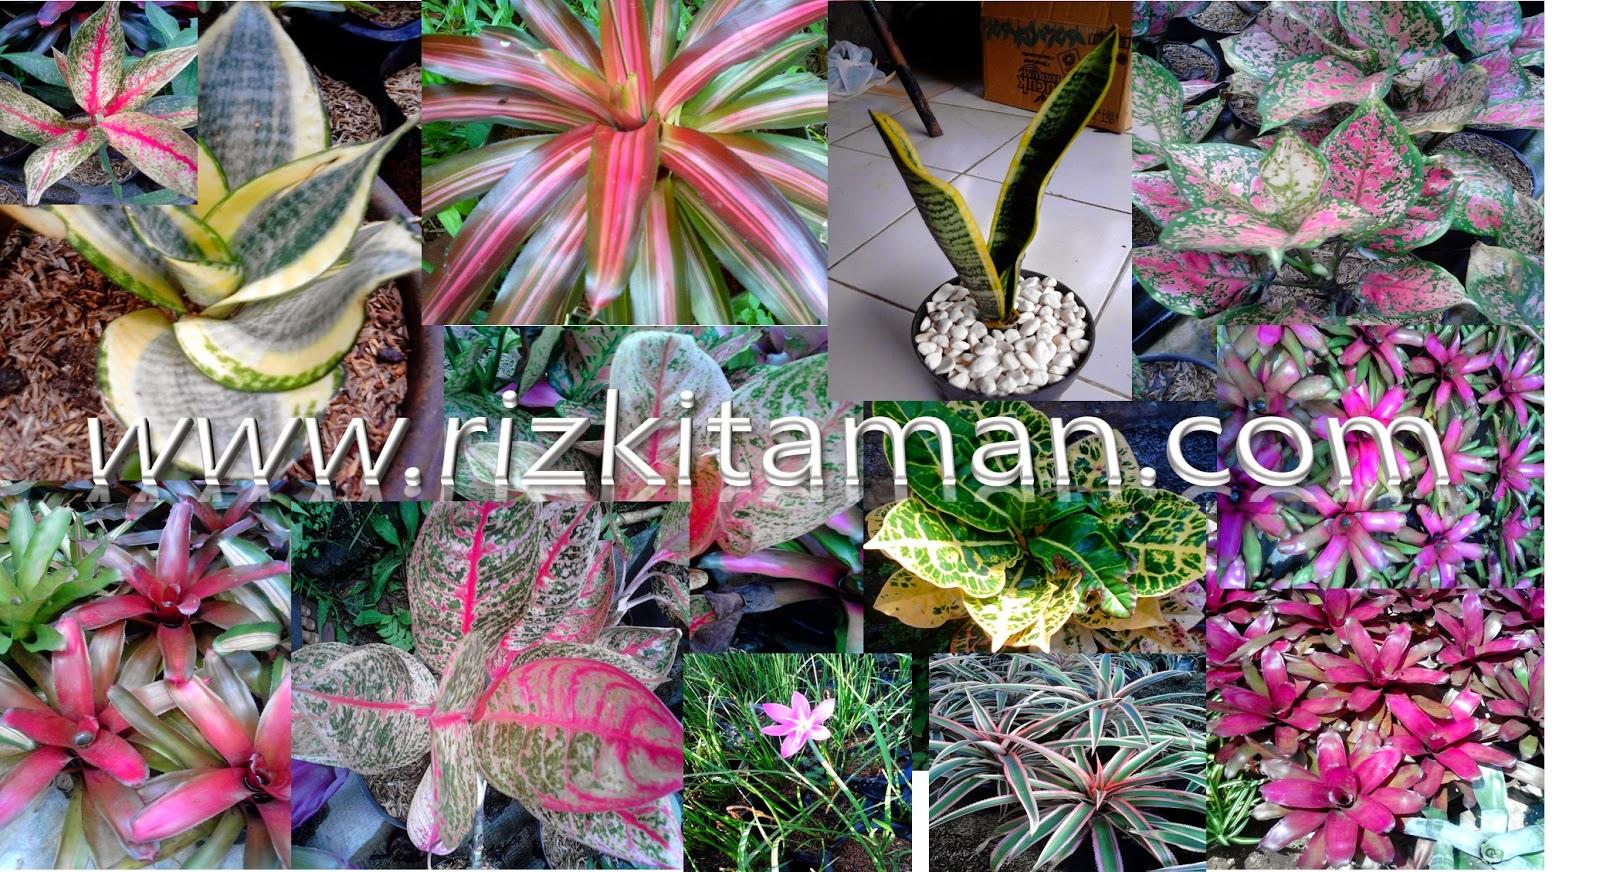 Jual tanaman indoor | aglaoenema, bromelia, puring, sansevireia goldn hahni, lidah mertua, suplier tanaman hias